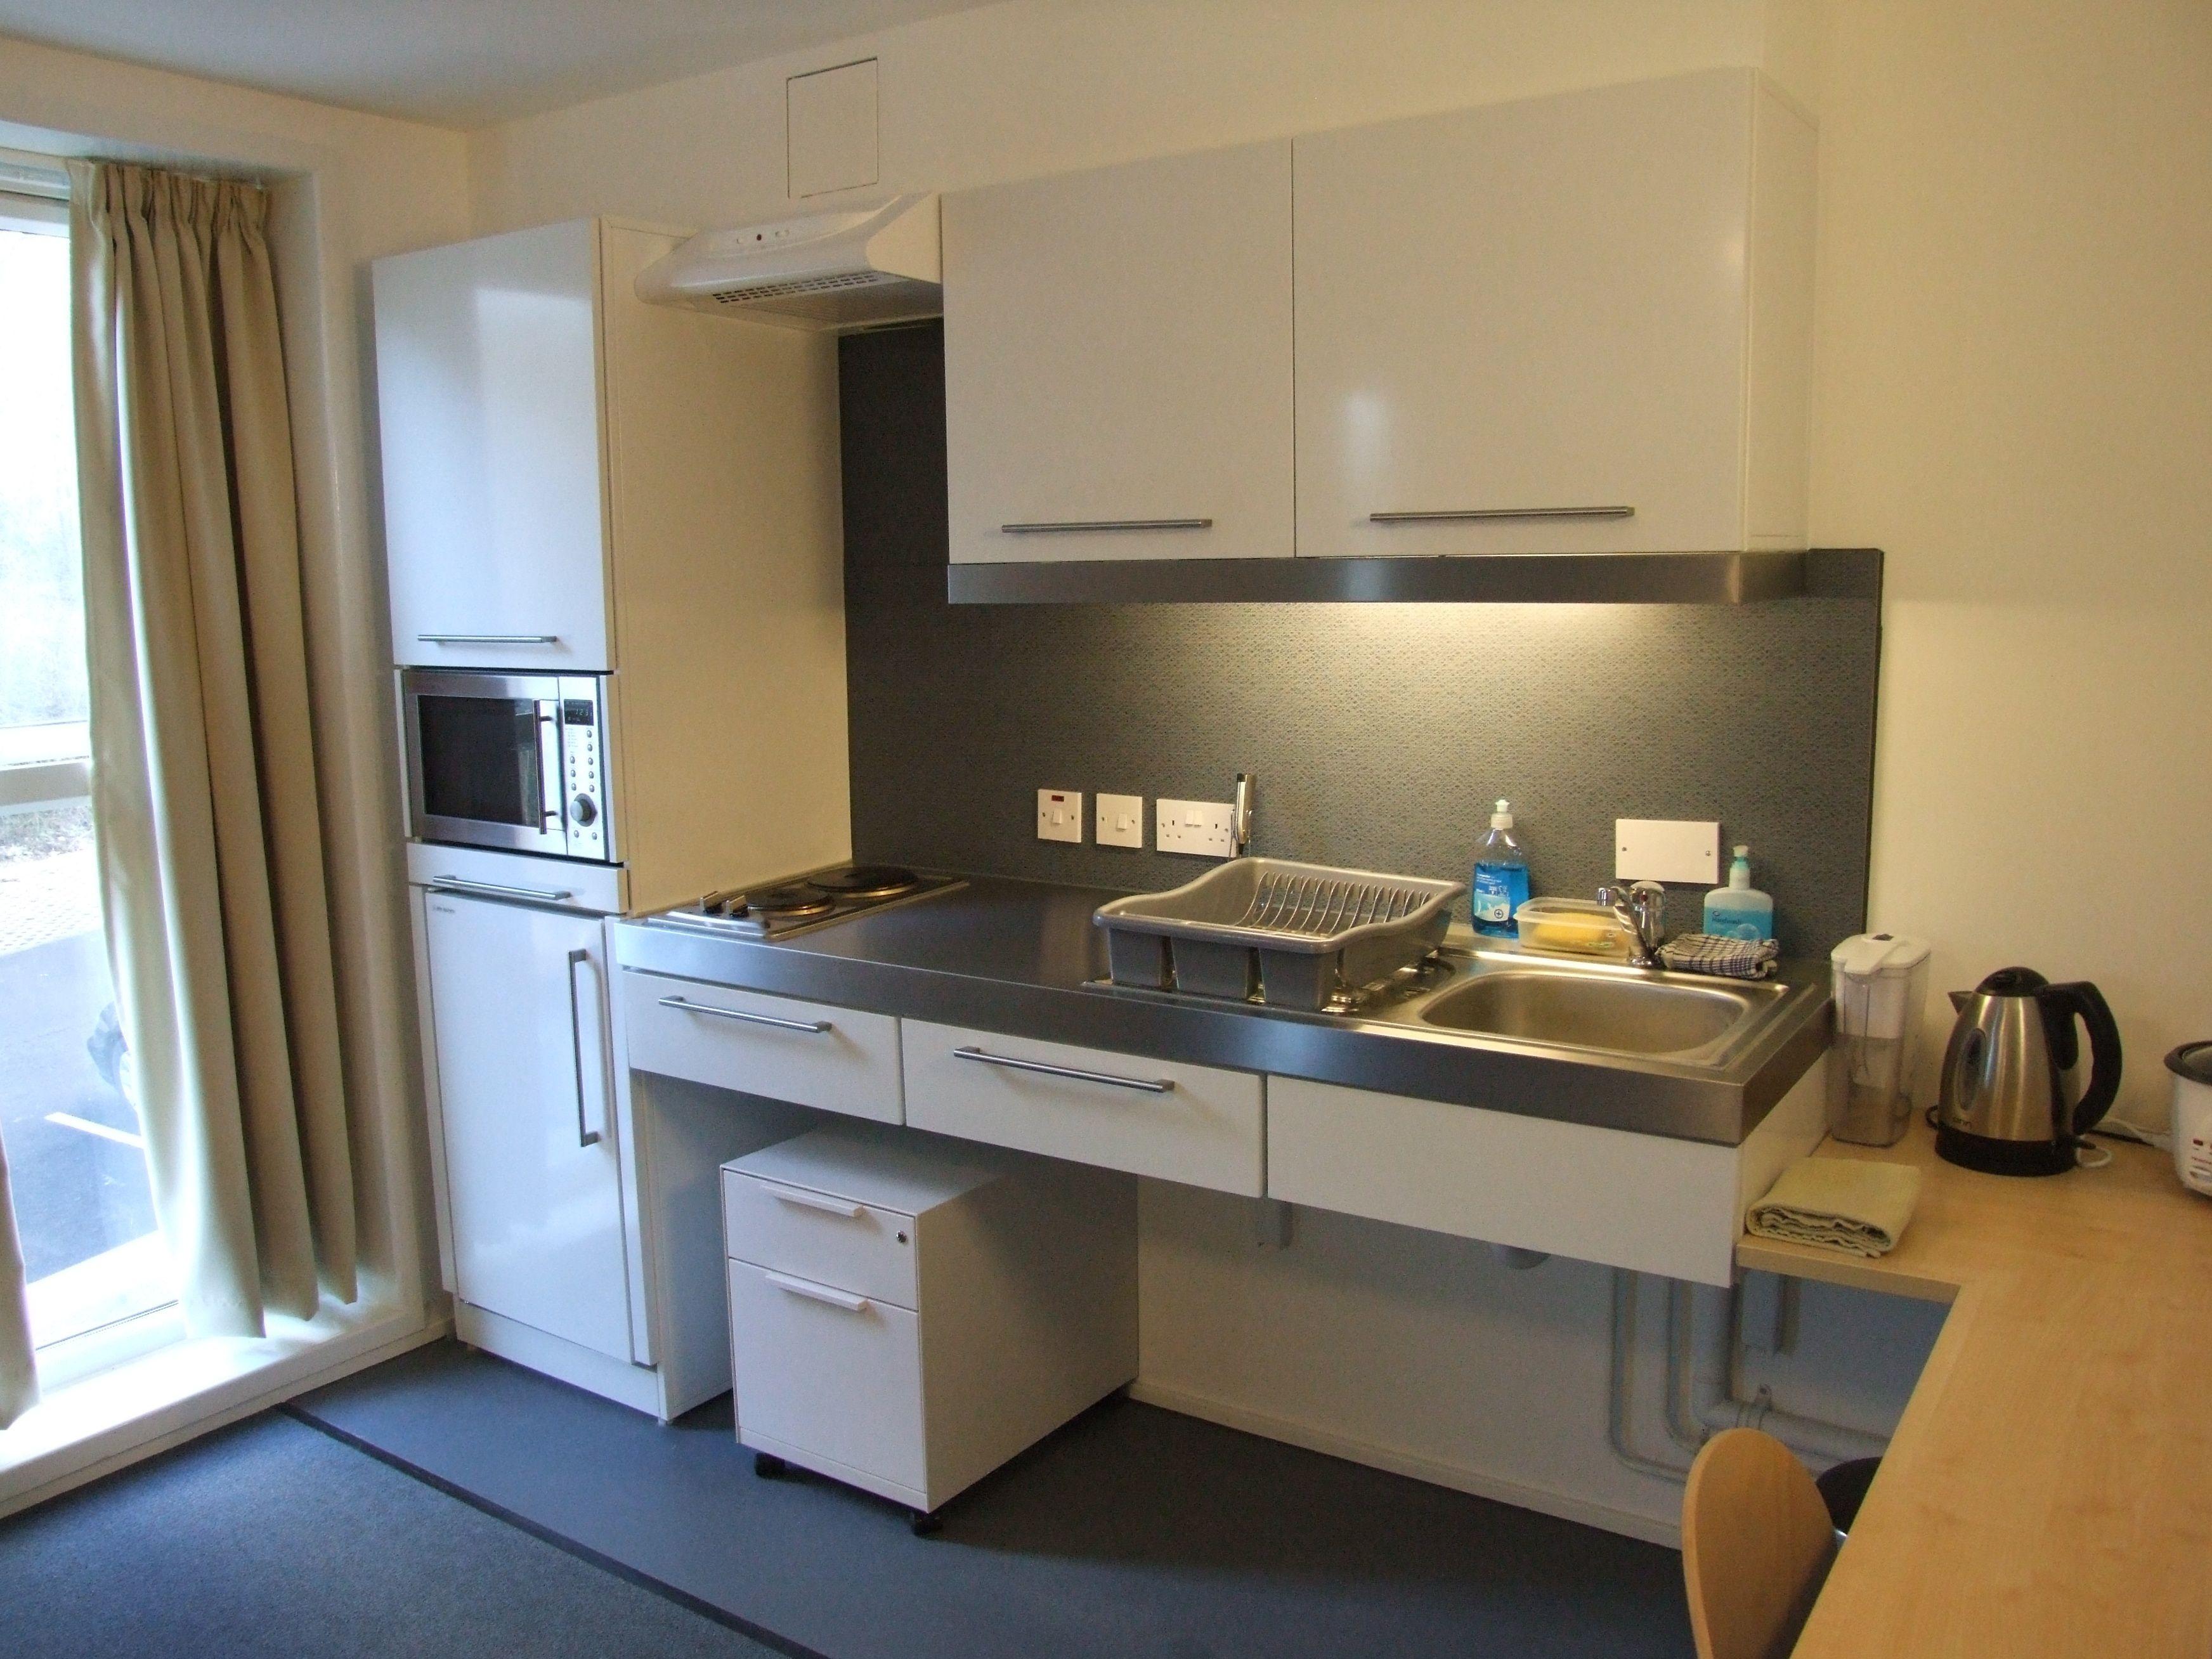 Kitchen Design For Disabled. Accessible DDA Student Kitchen  University of Kent Elfin Kitchens